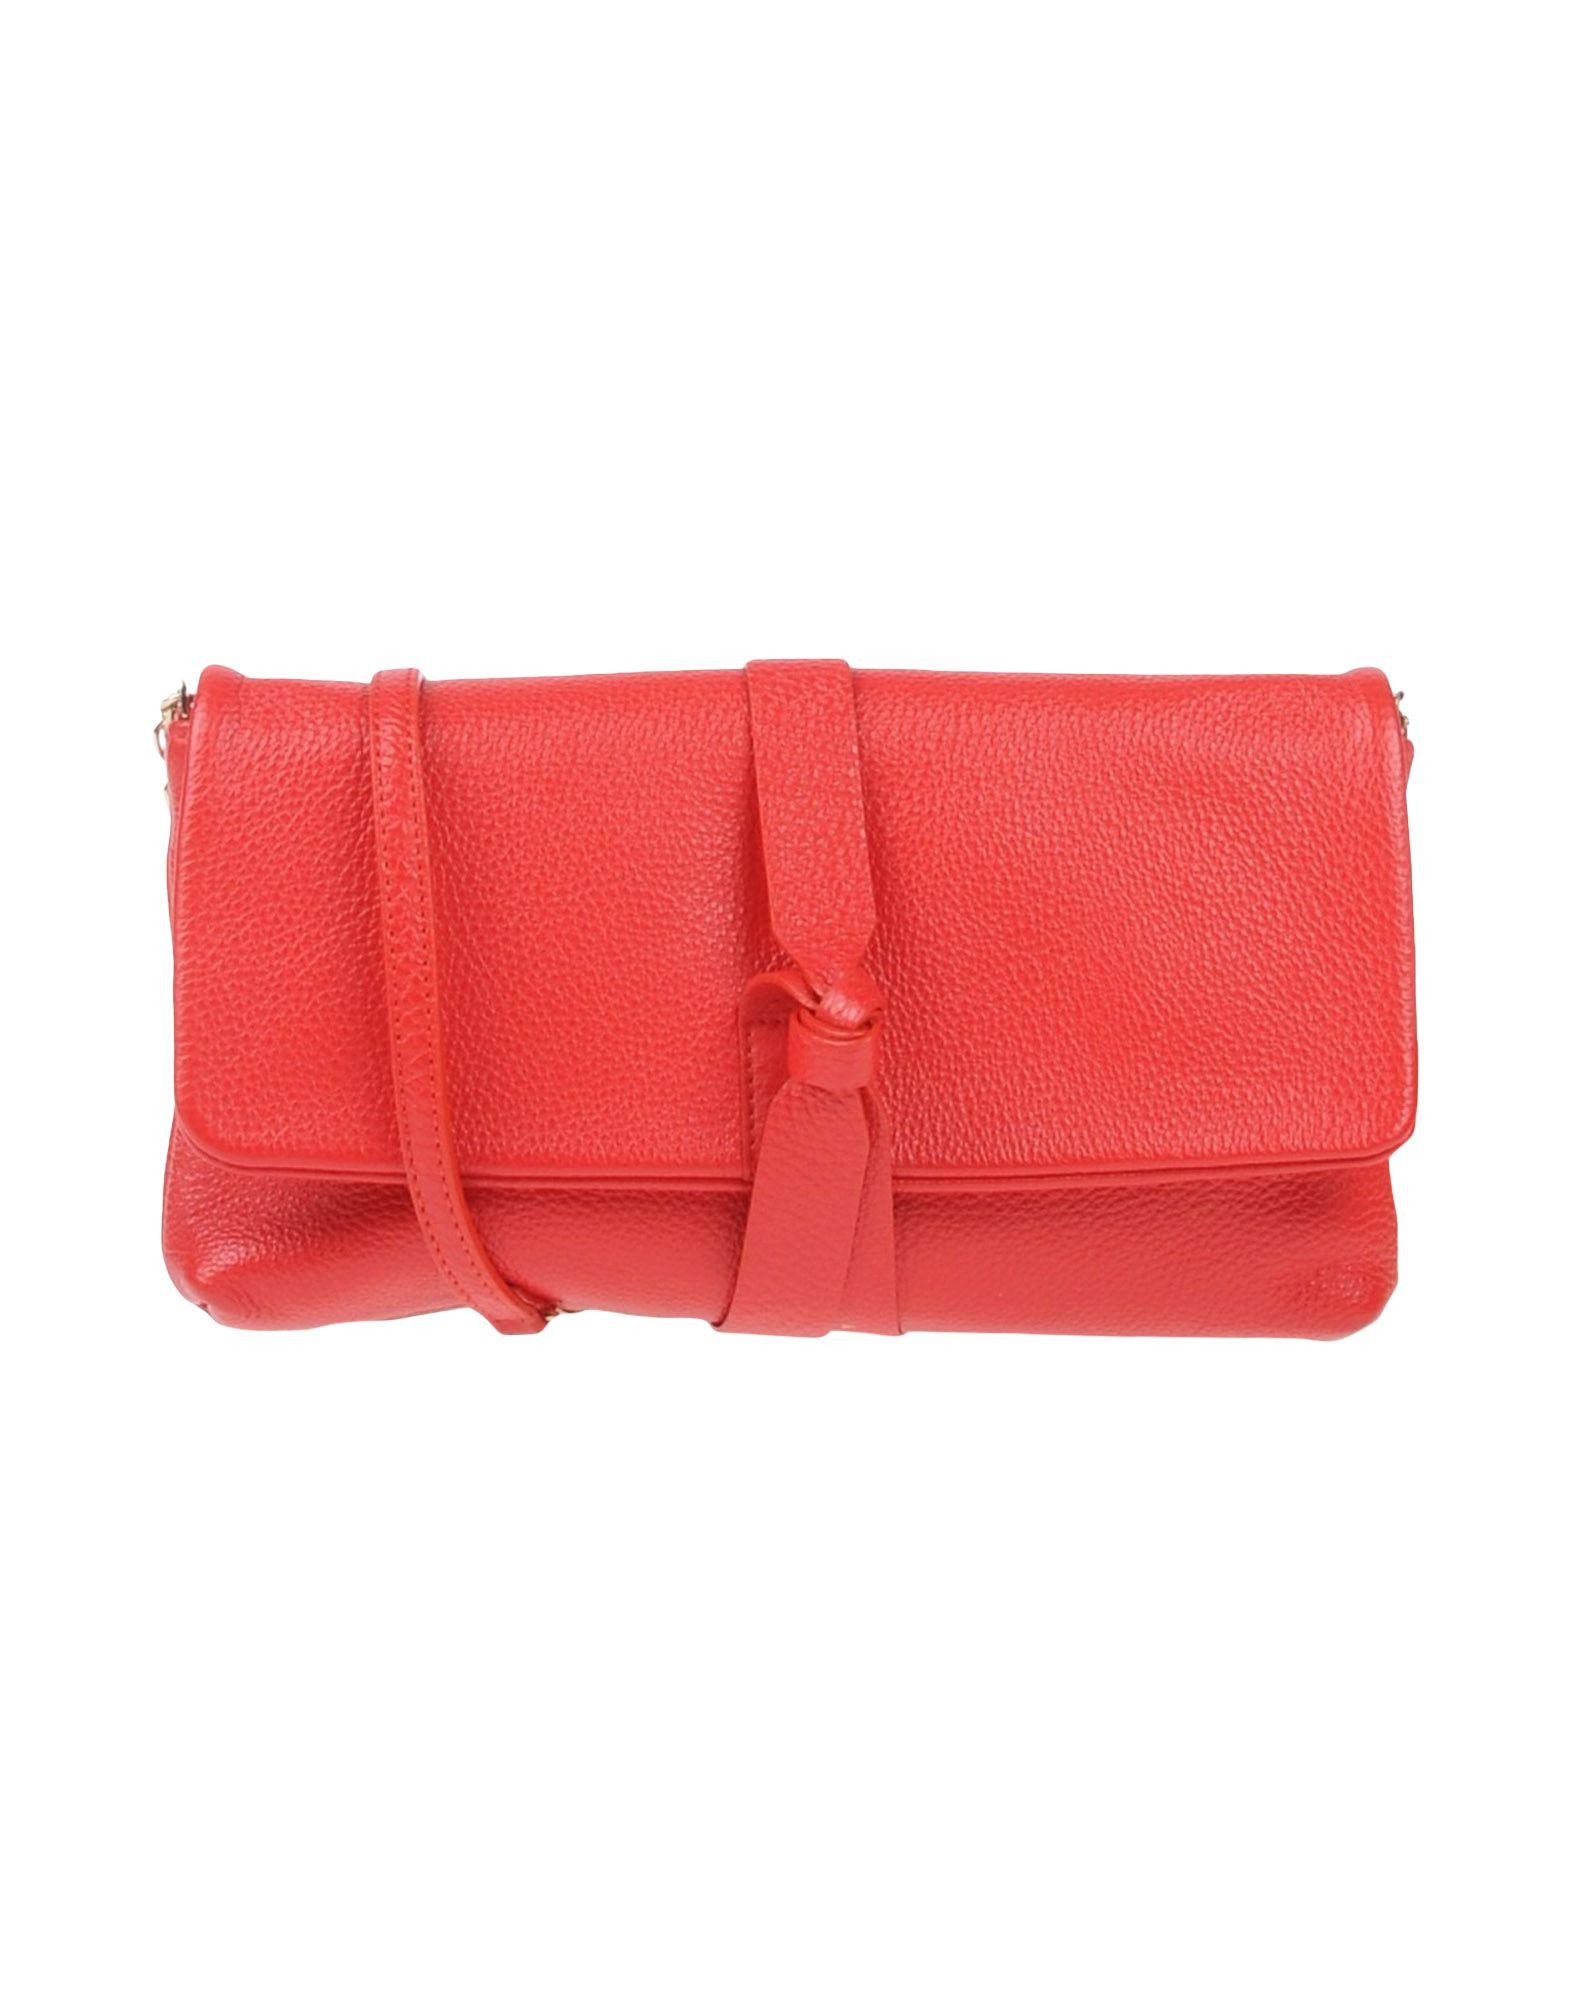 COCCINELLE Сумка через плечо сумка coccinelle e1 ad9 55 b7 01 209